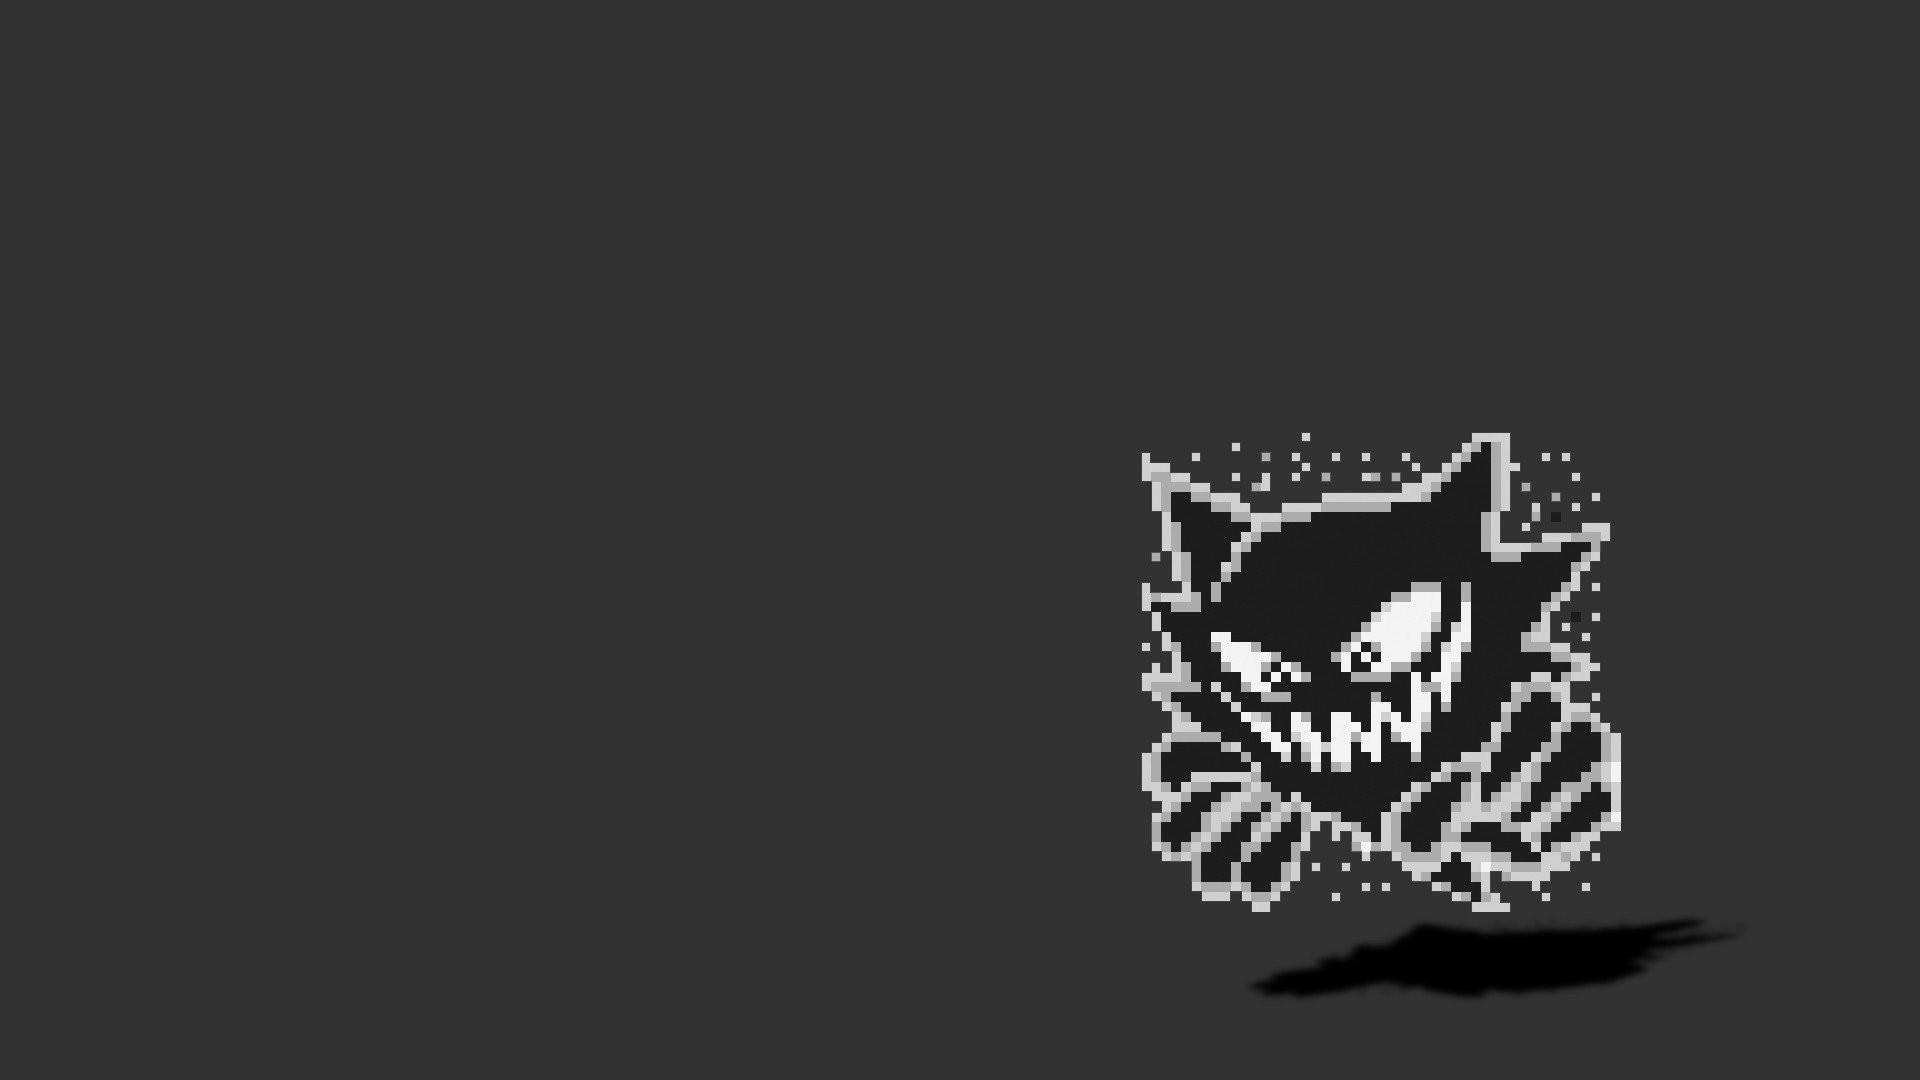 Video Game РPok̩mon Haunter (Pok̩mon) Ghost Pok̩mon Wallpaper